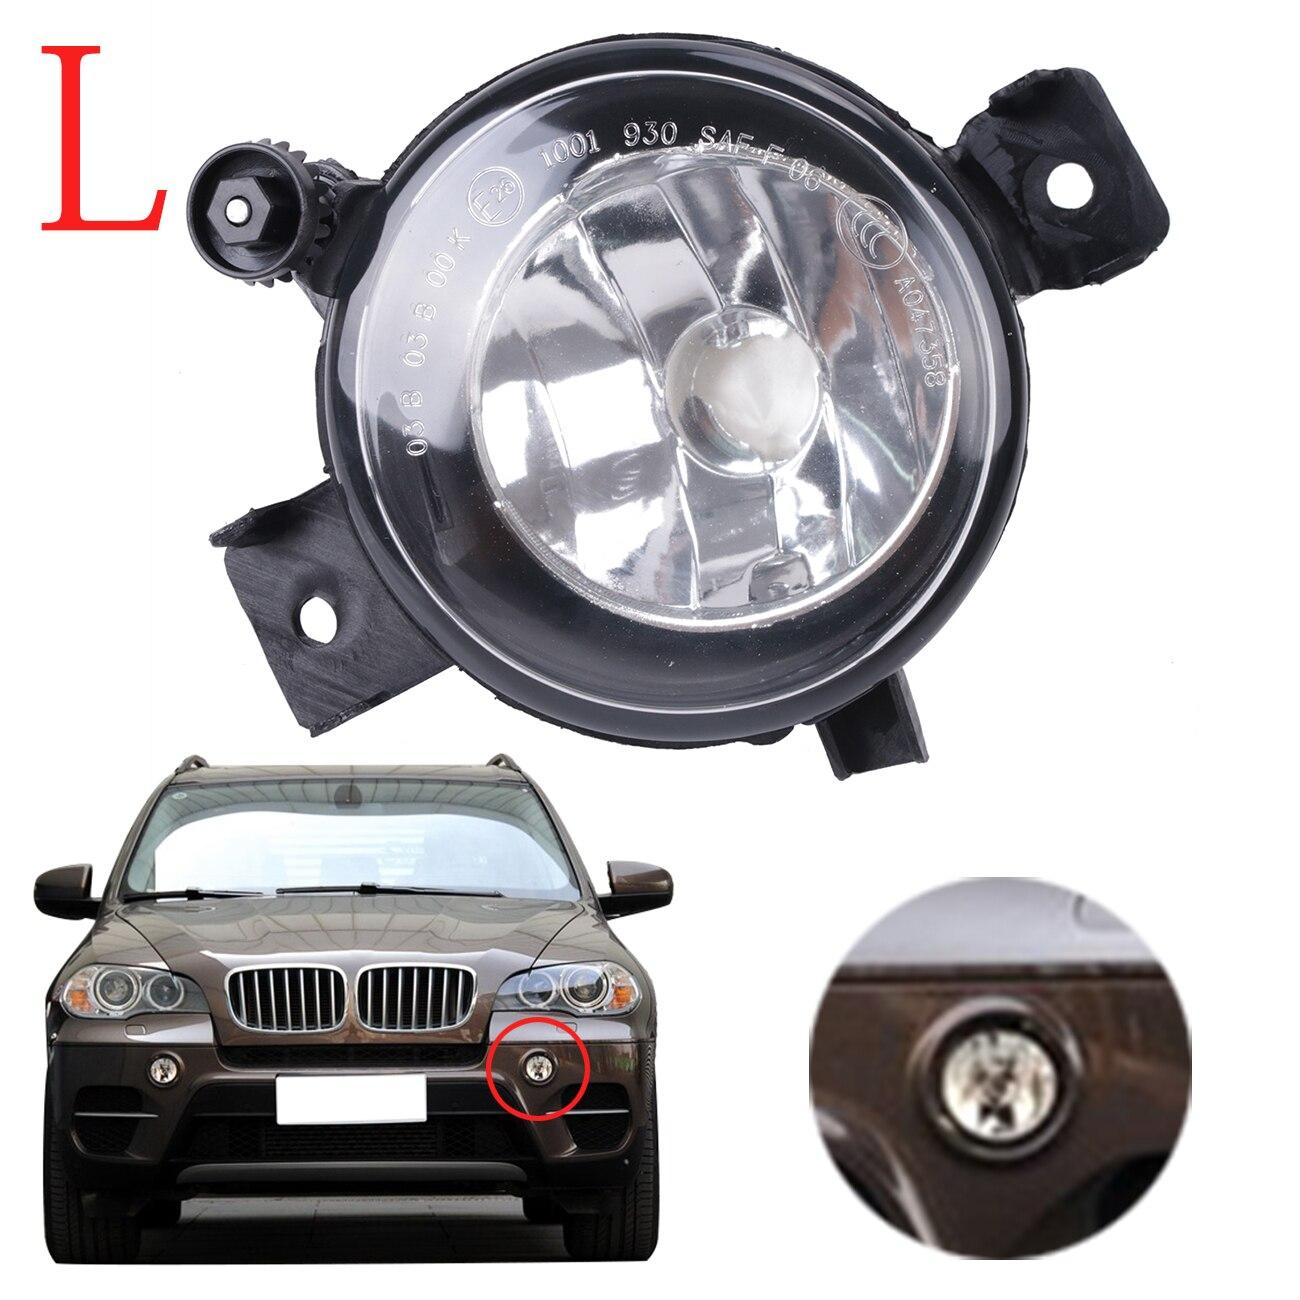 Car-Styling Left Side Bumper Fog Light Clear Glass Lens Driving Lamp Foglamp For BMW X5 E70 2011 2012 2013 63177224643 #W086-L<br><br>Aliexpress